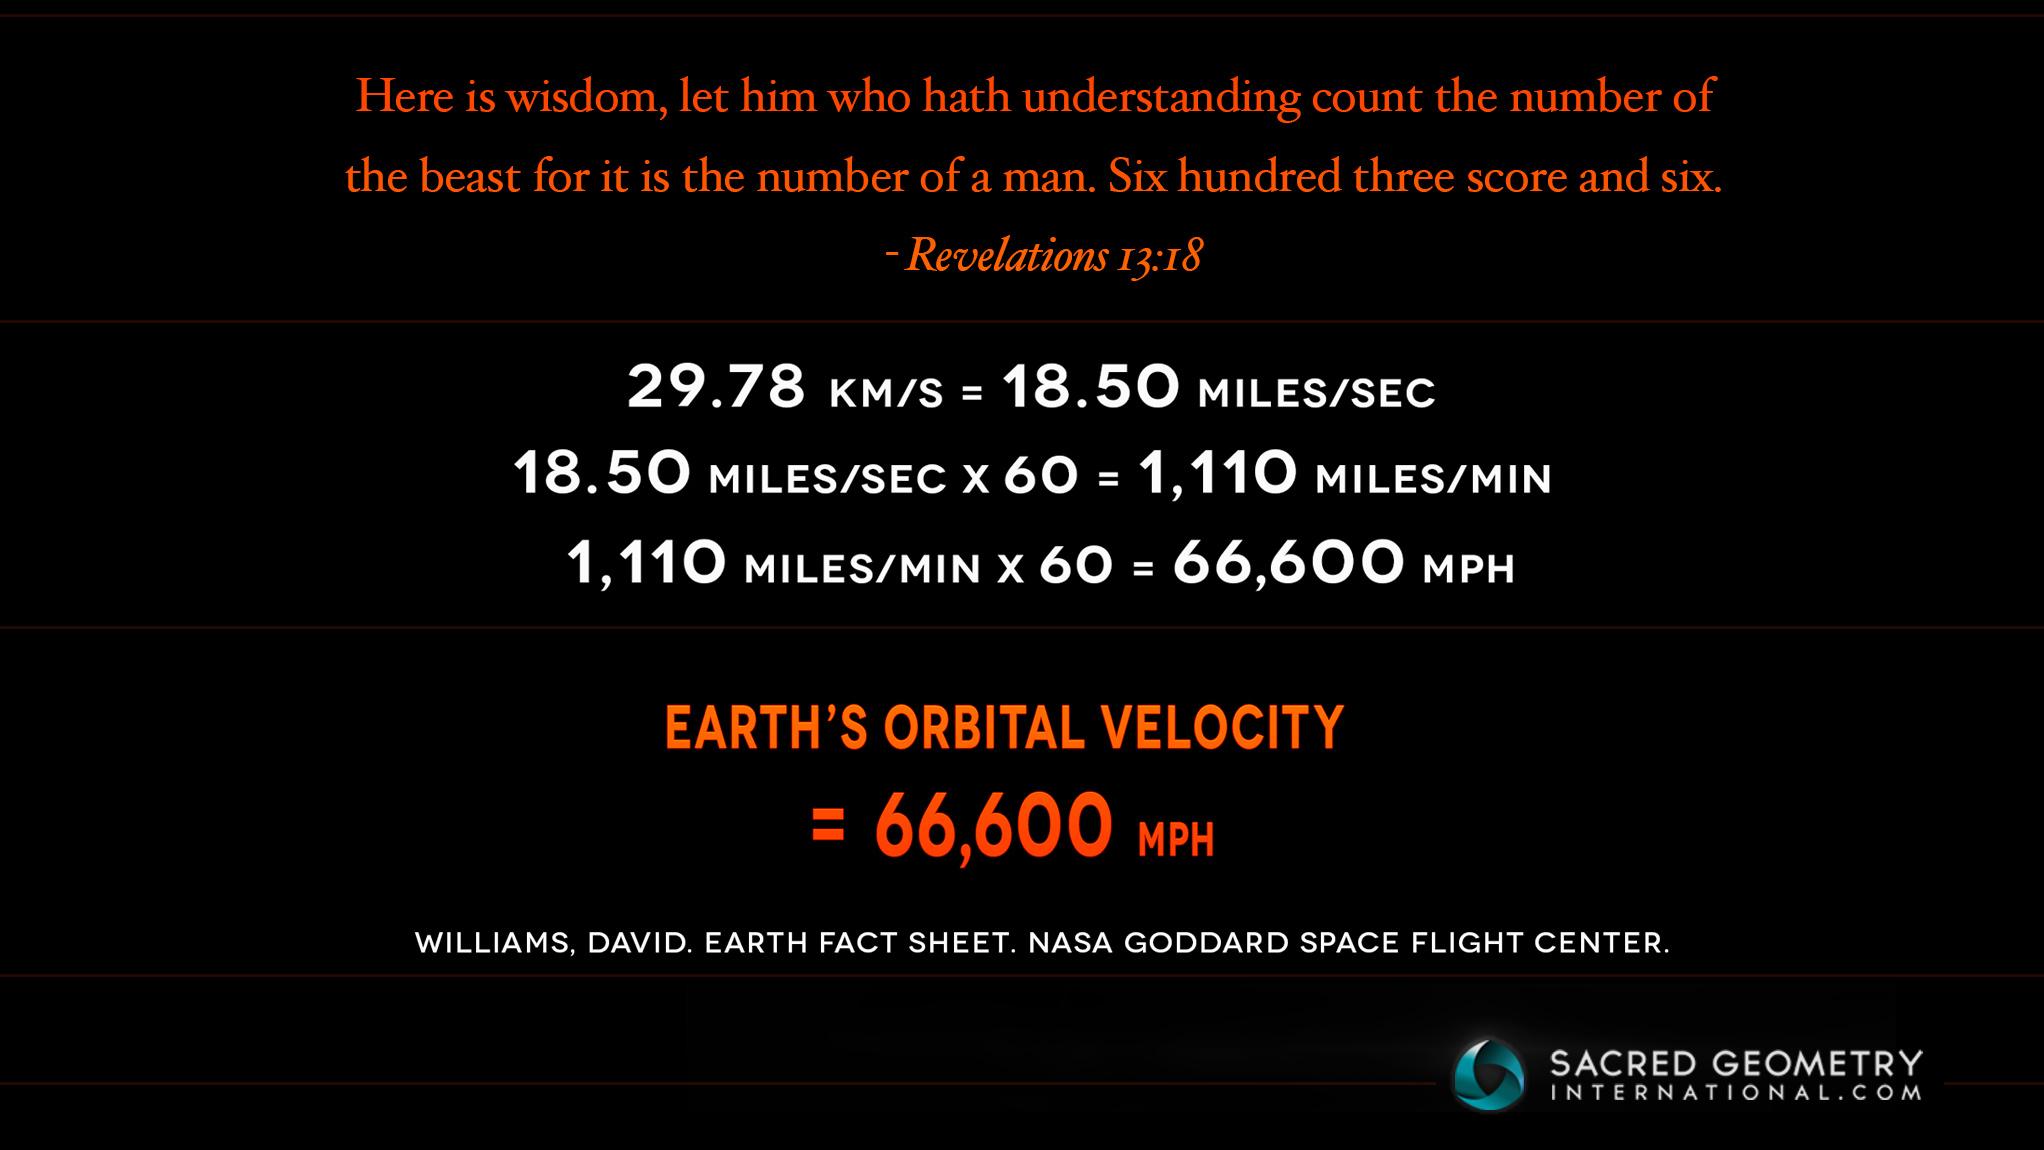 SGI_666_Meme_Orbital_Velocity